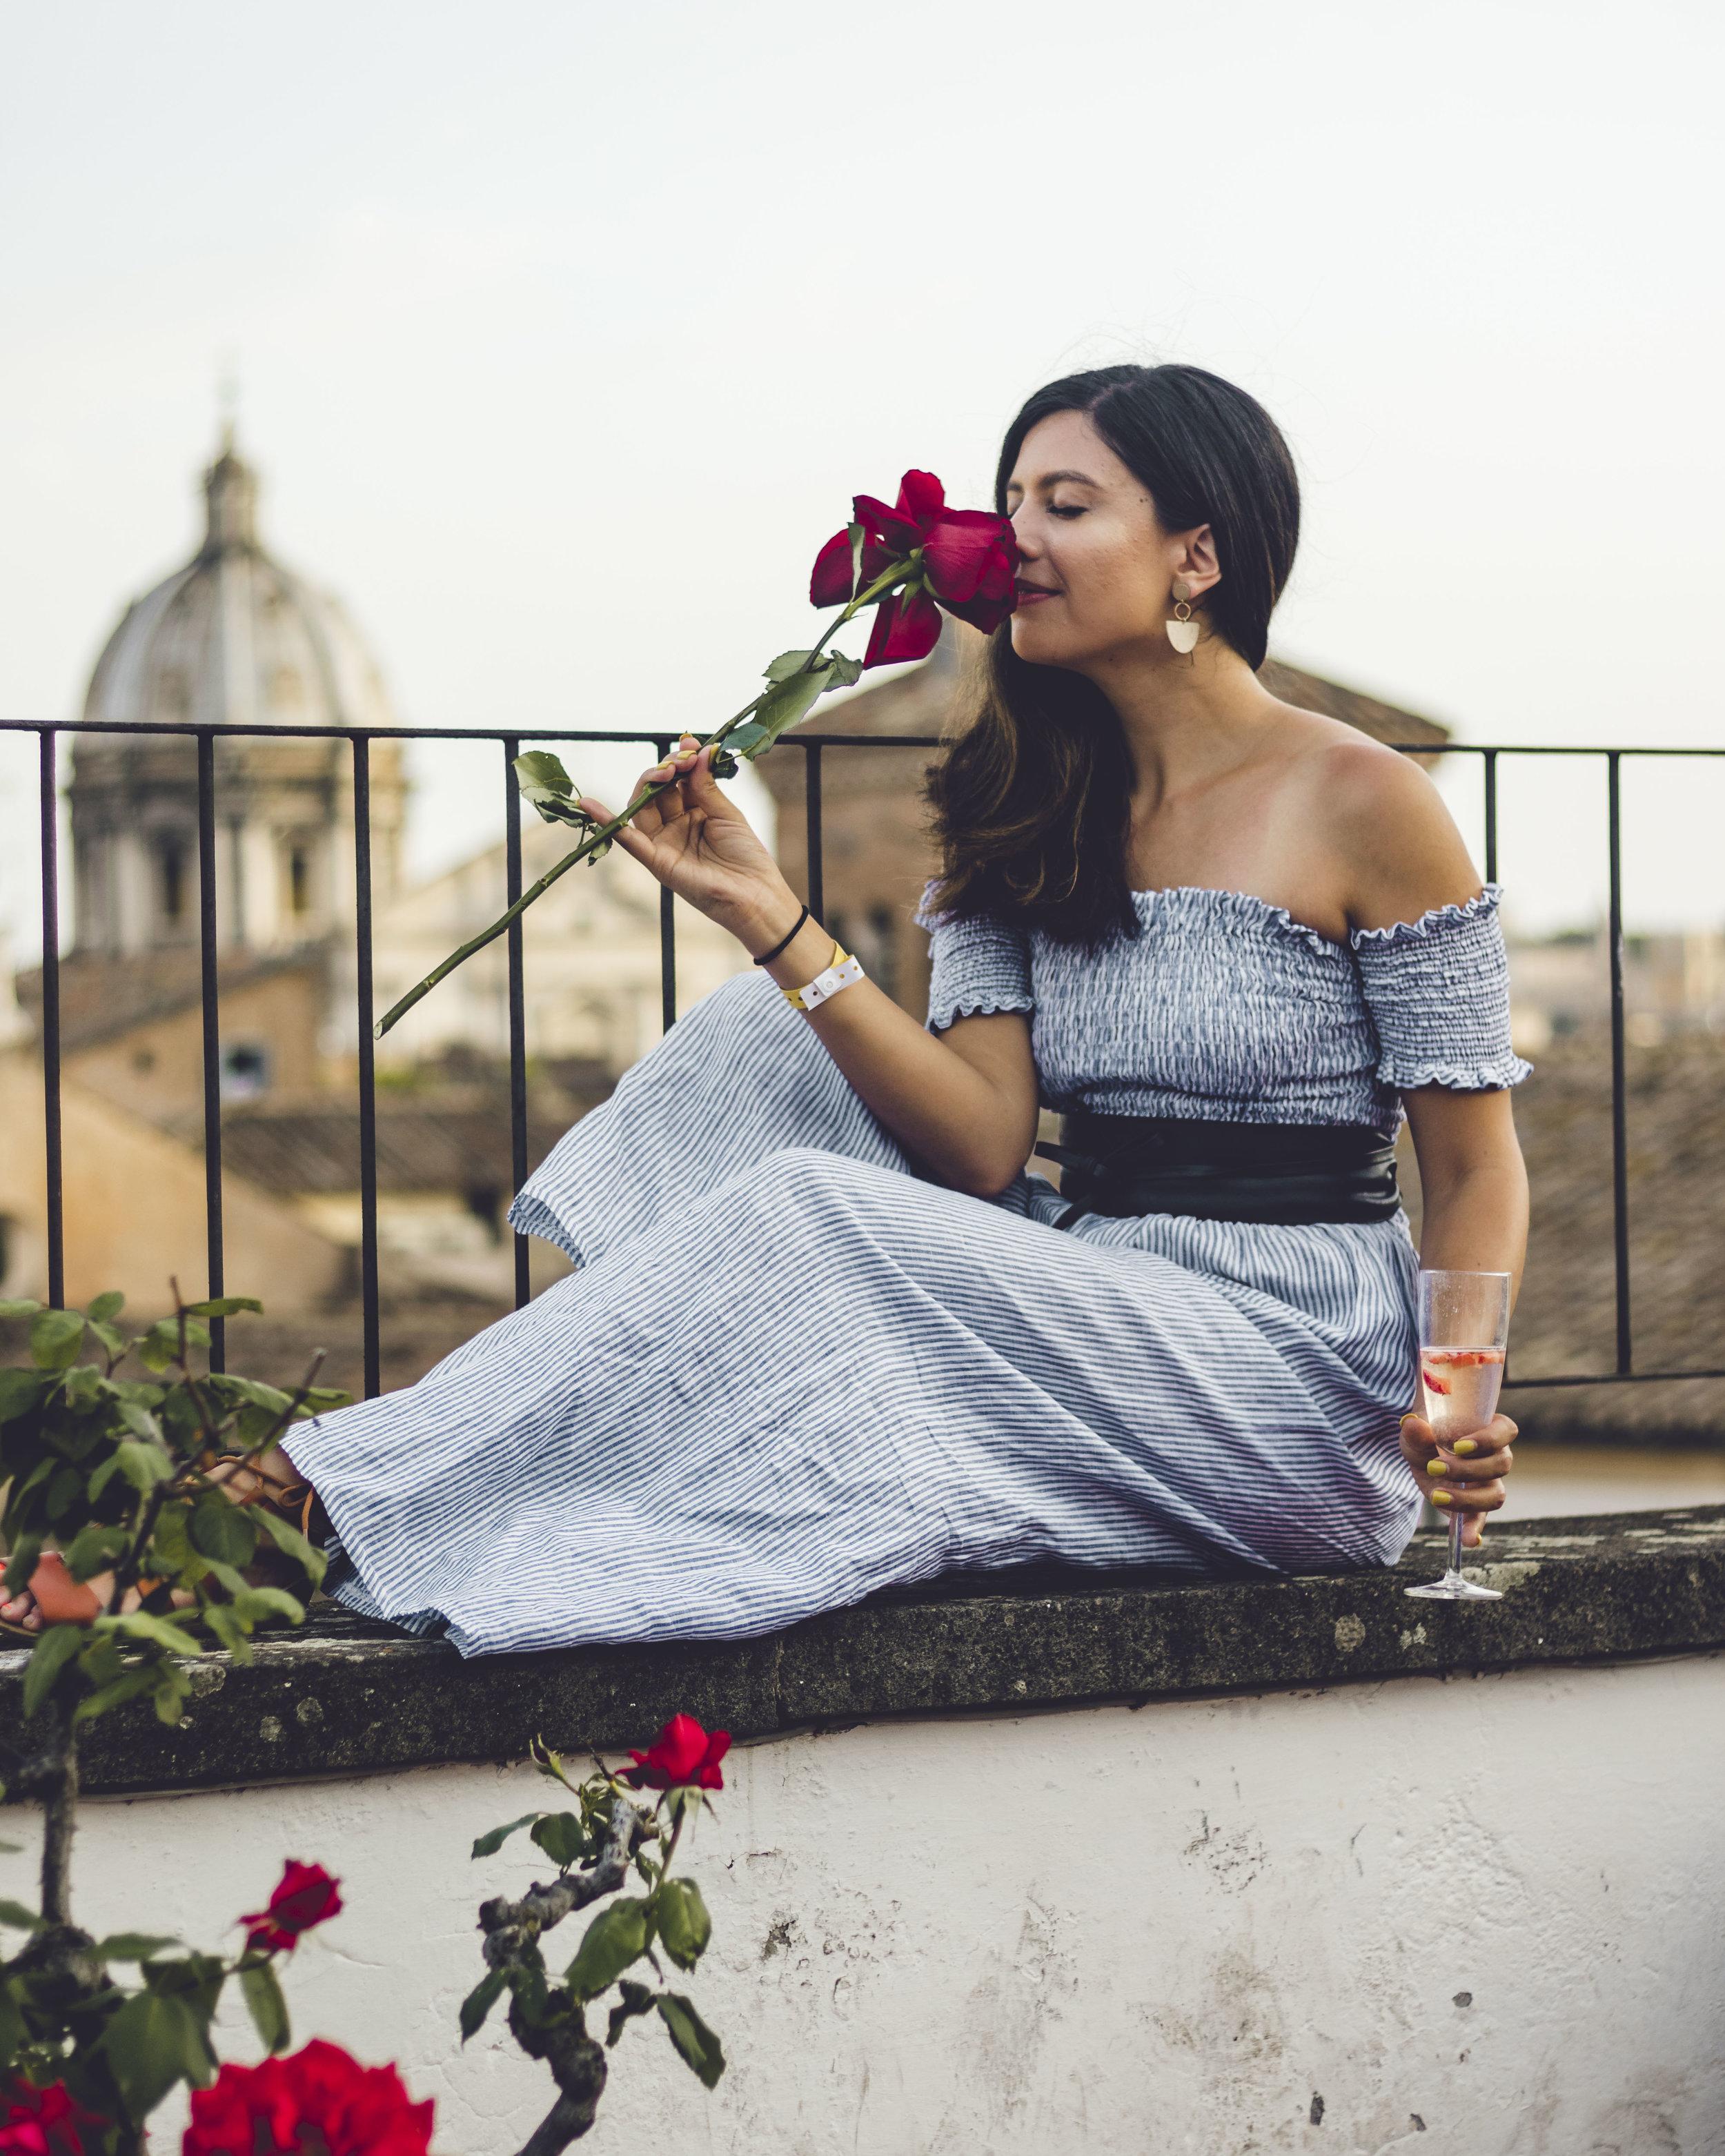 Rachel Off Duty: Woman Smelling Roses